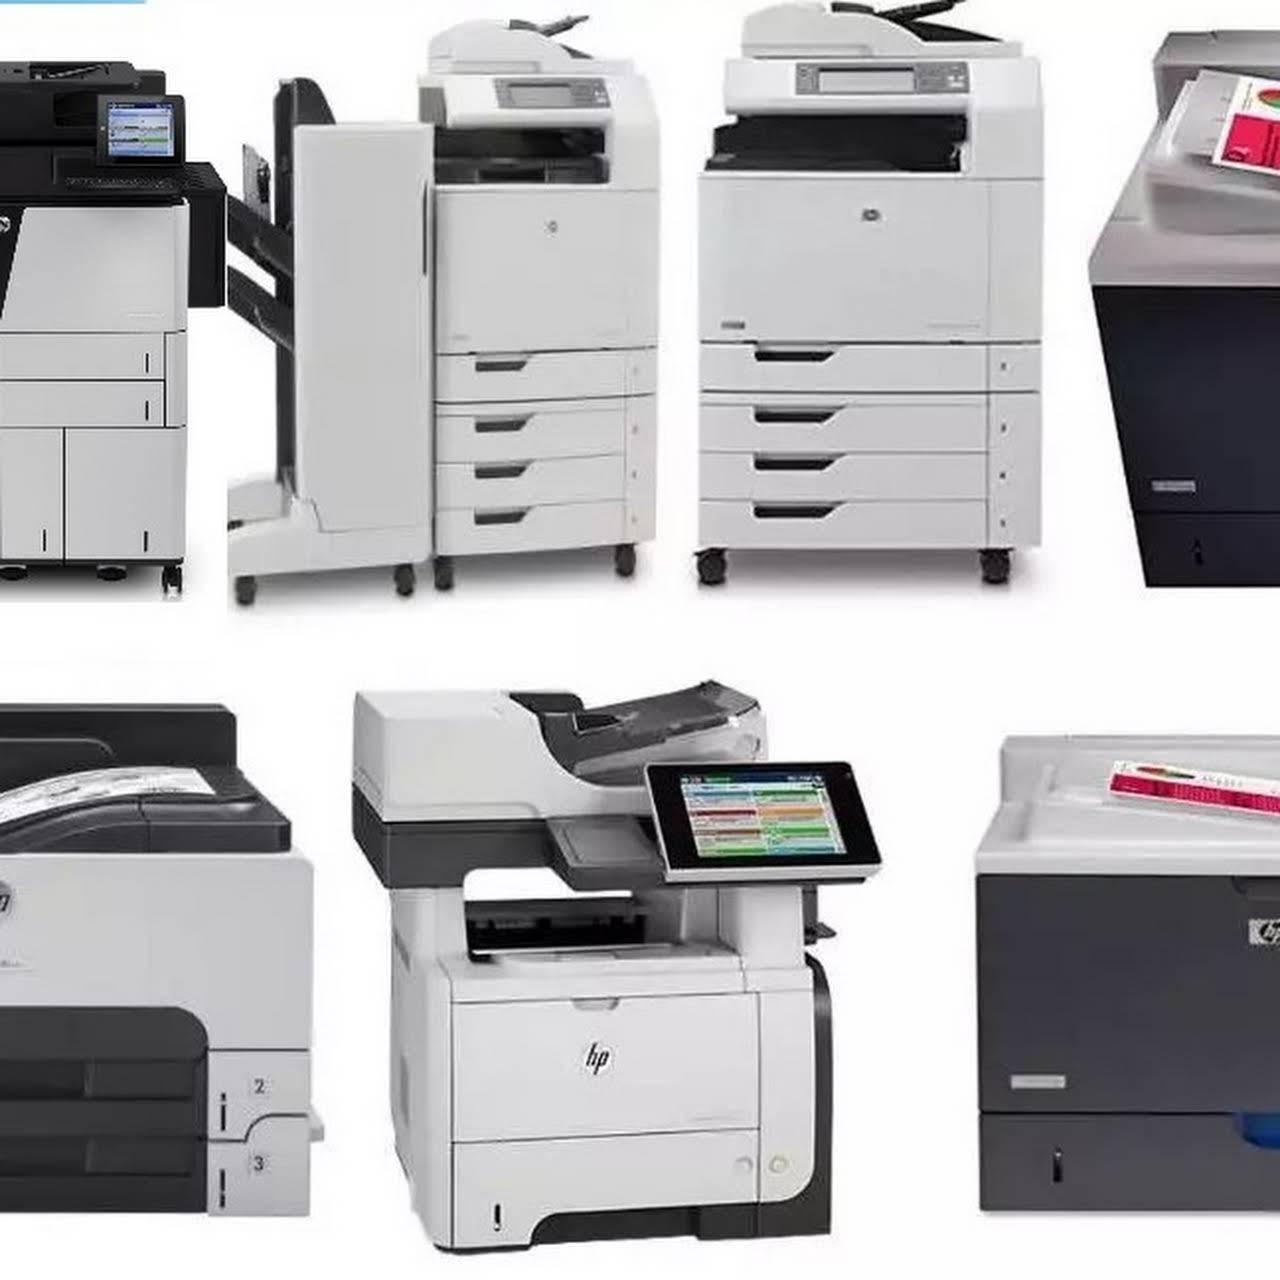 4MP Tech Printer & Copier Specialists - BRISBANE - GOLD